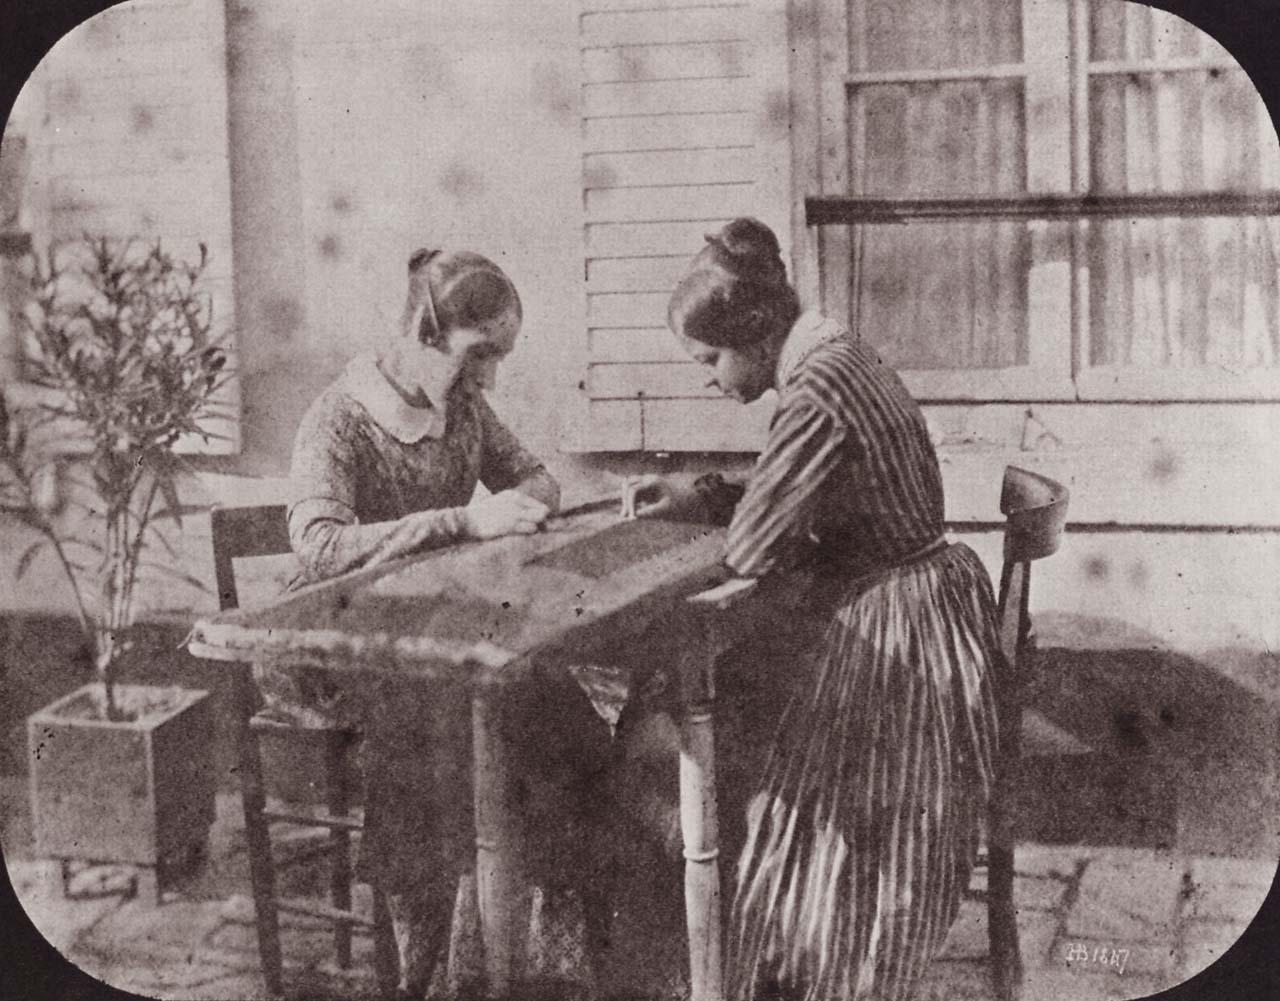 H. Bayard: Due ricamatrici all'aperto; 1847.